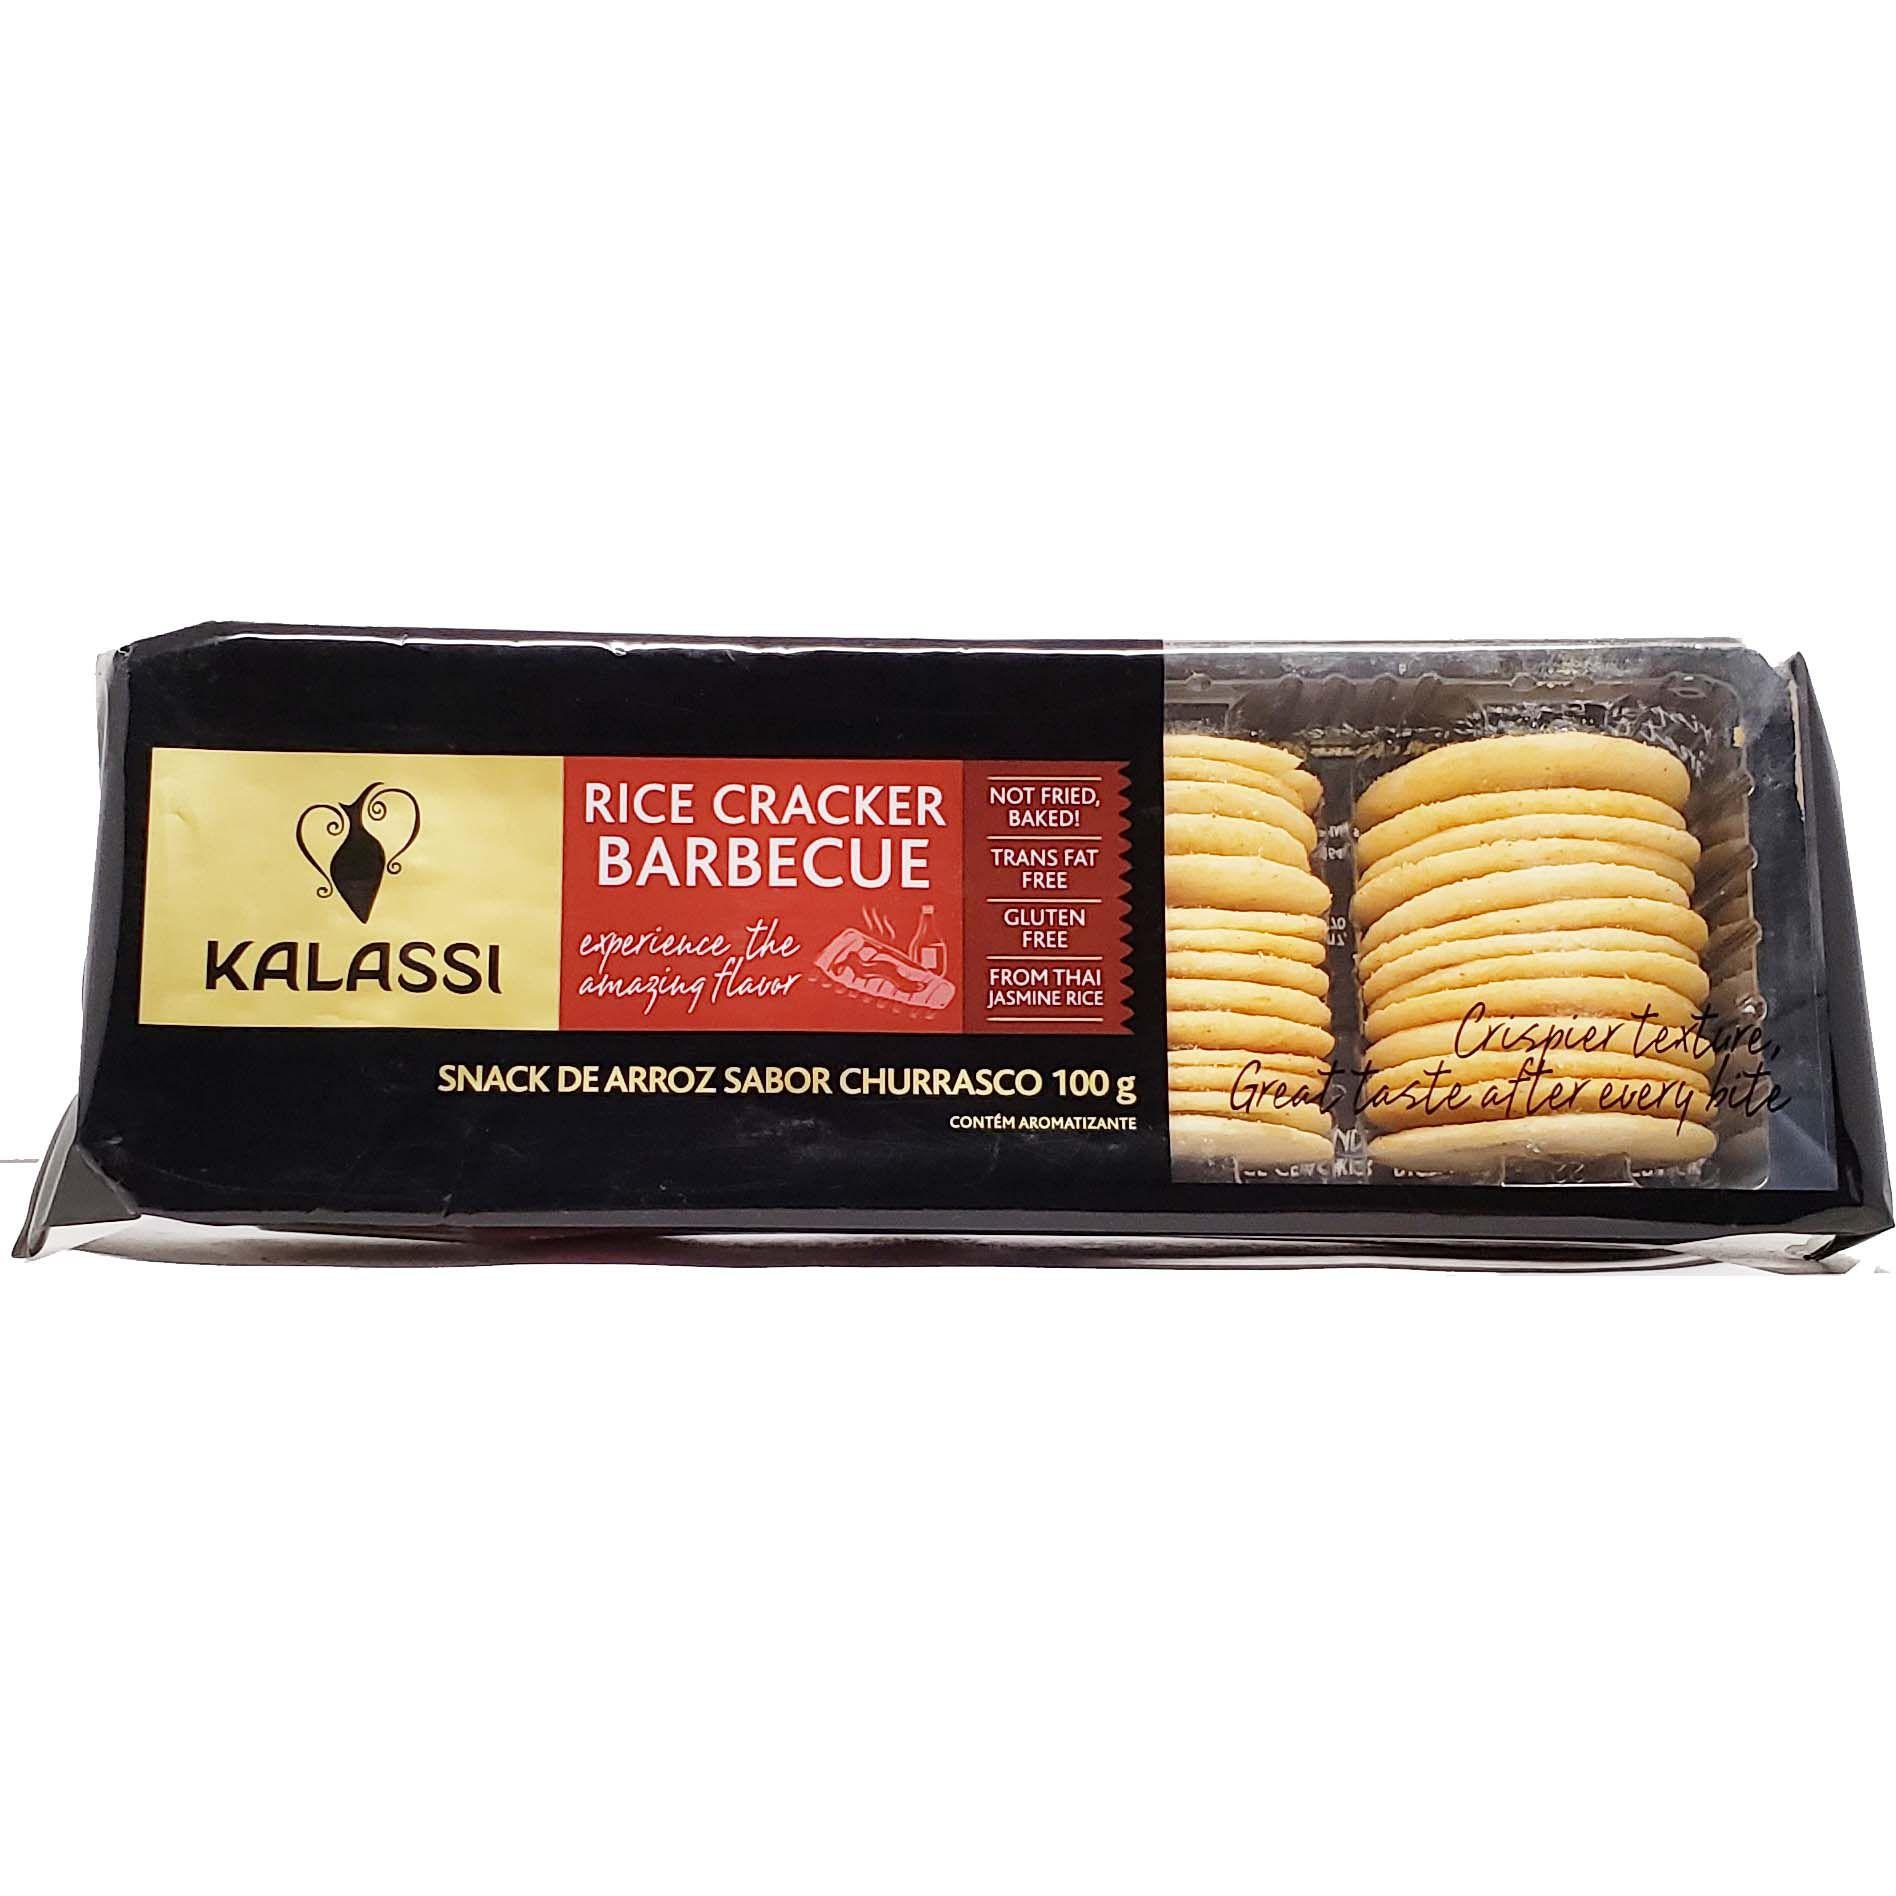 Snack De Arroz Sabor Churrasco Kalassi - 100g -